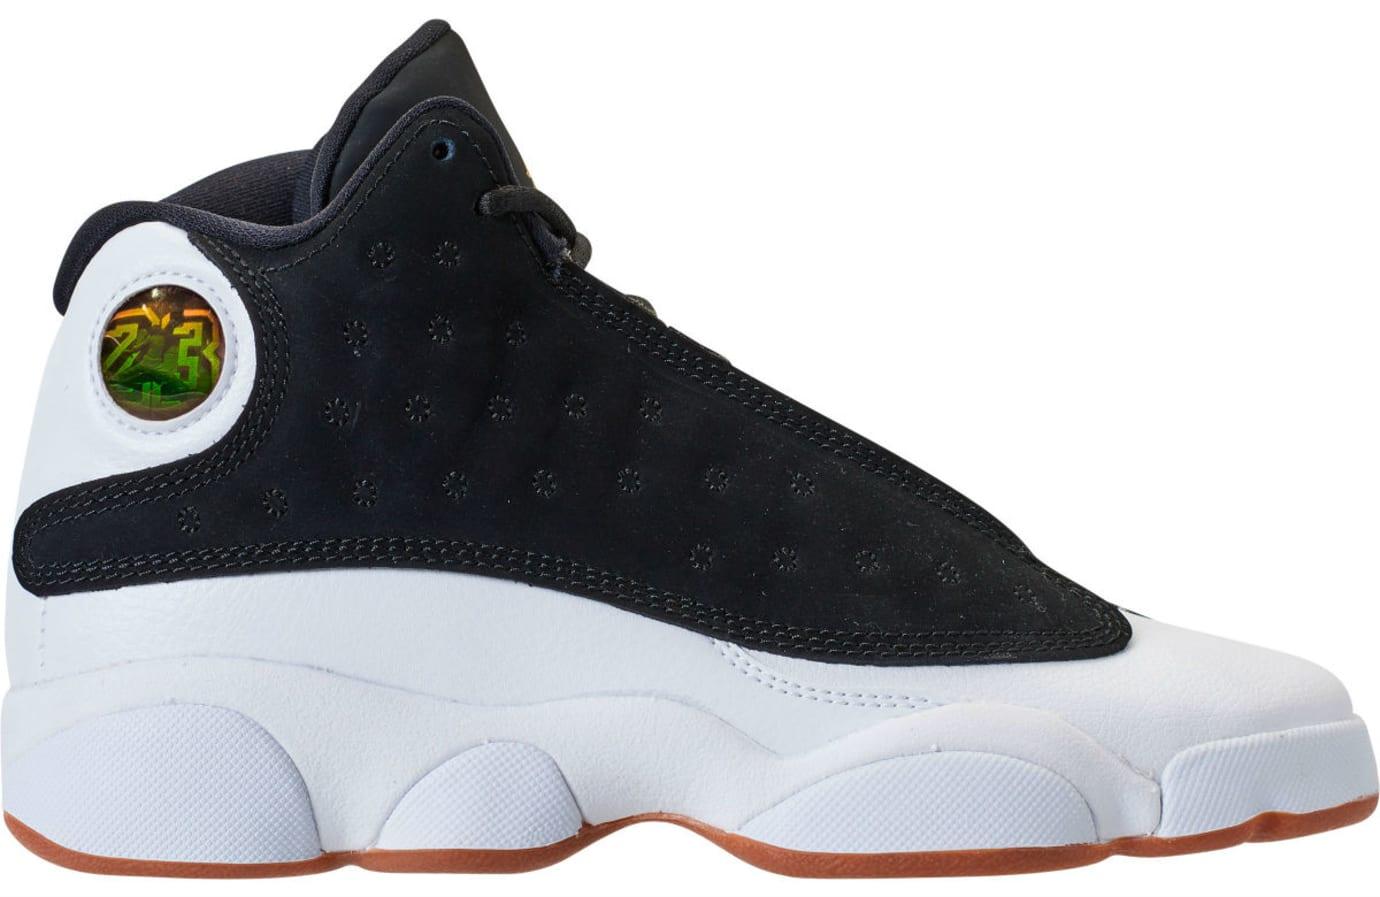 Air Jordan 13 Girls Black Gold White Gum Release Date 439358-021 Profile